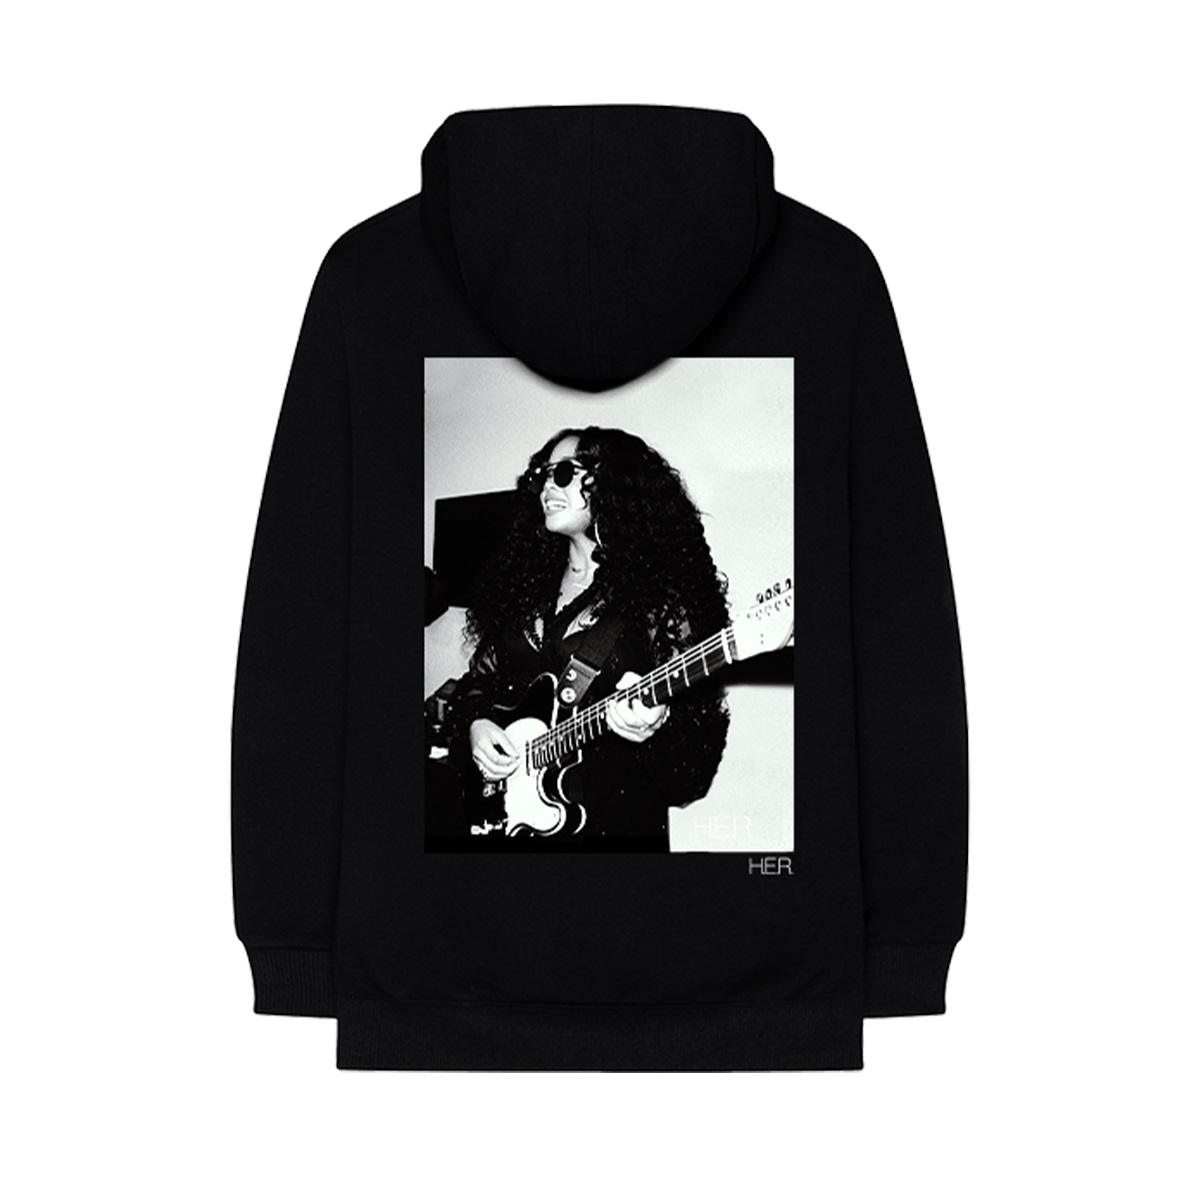 Girls With Guitars Black Sleeve-Text Hoodie